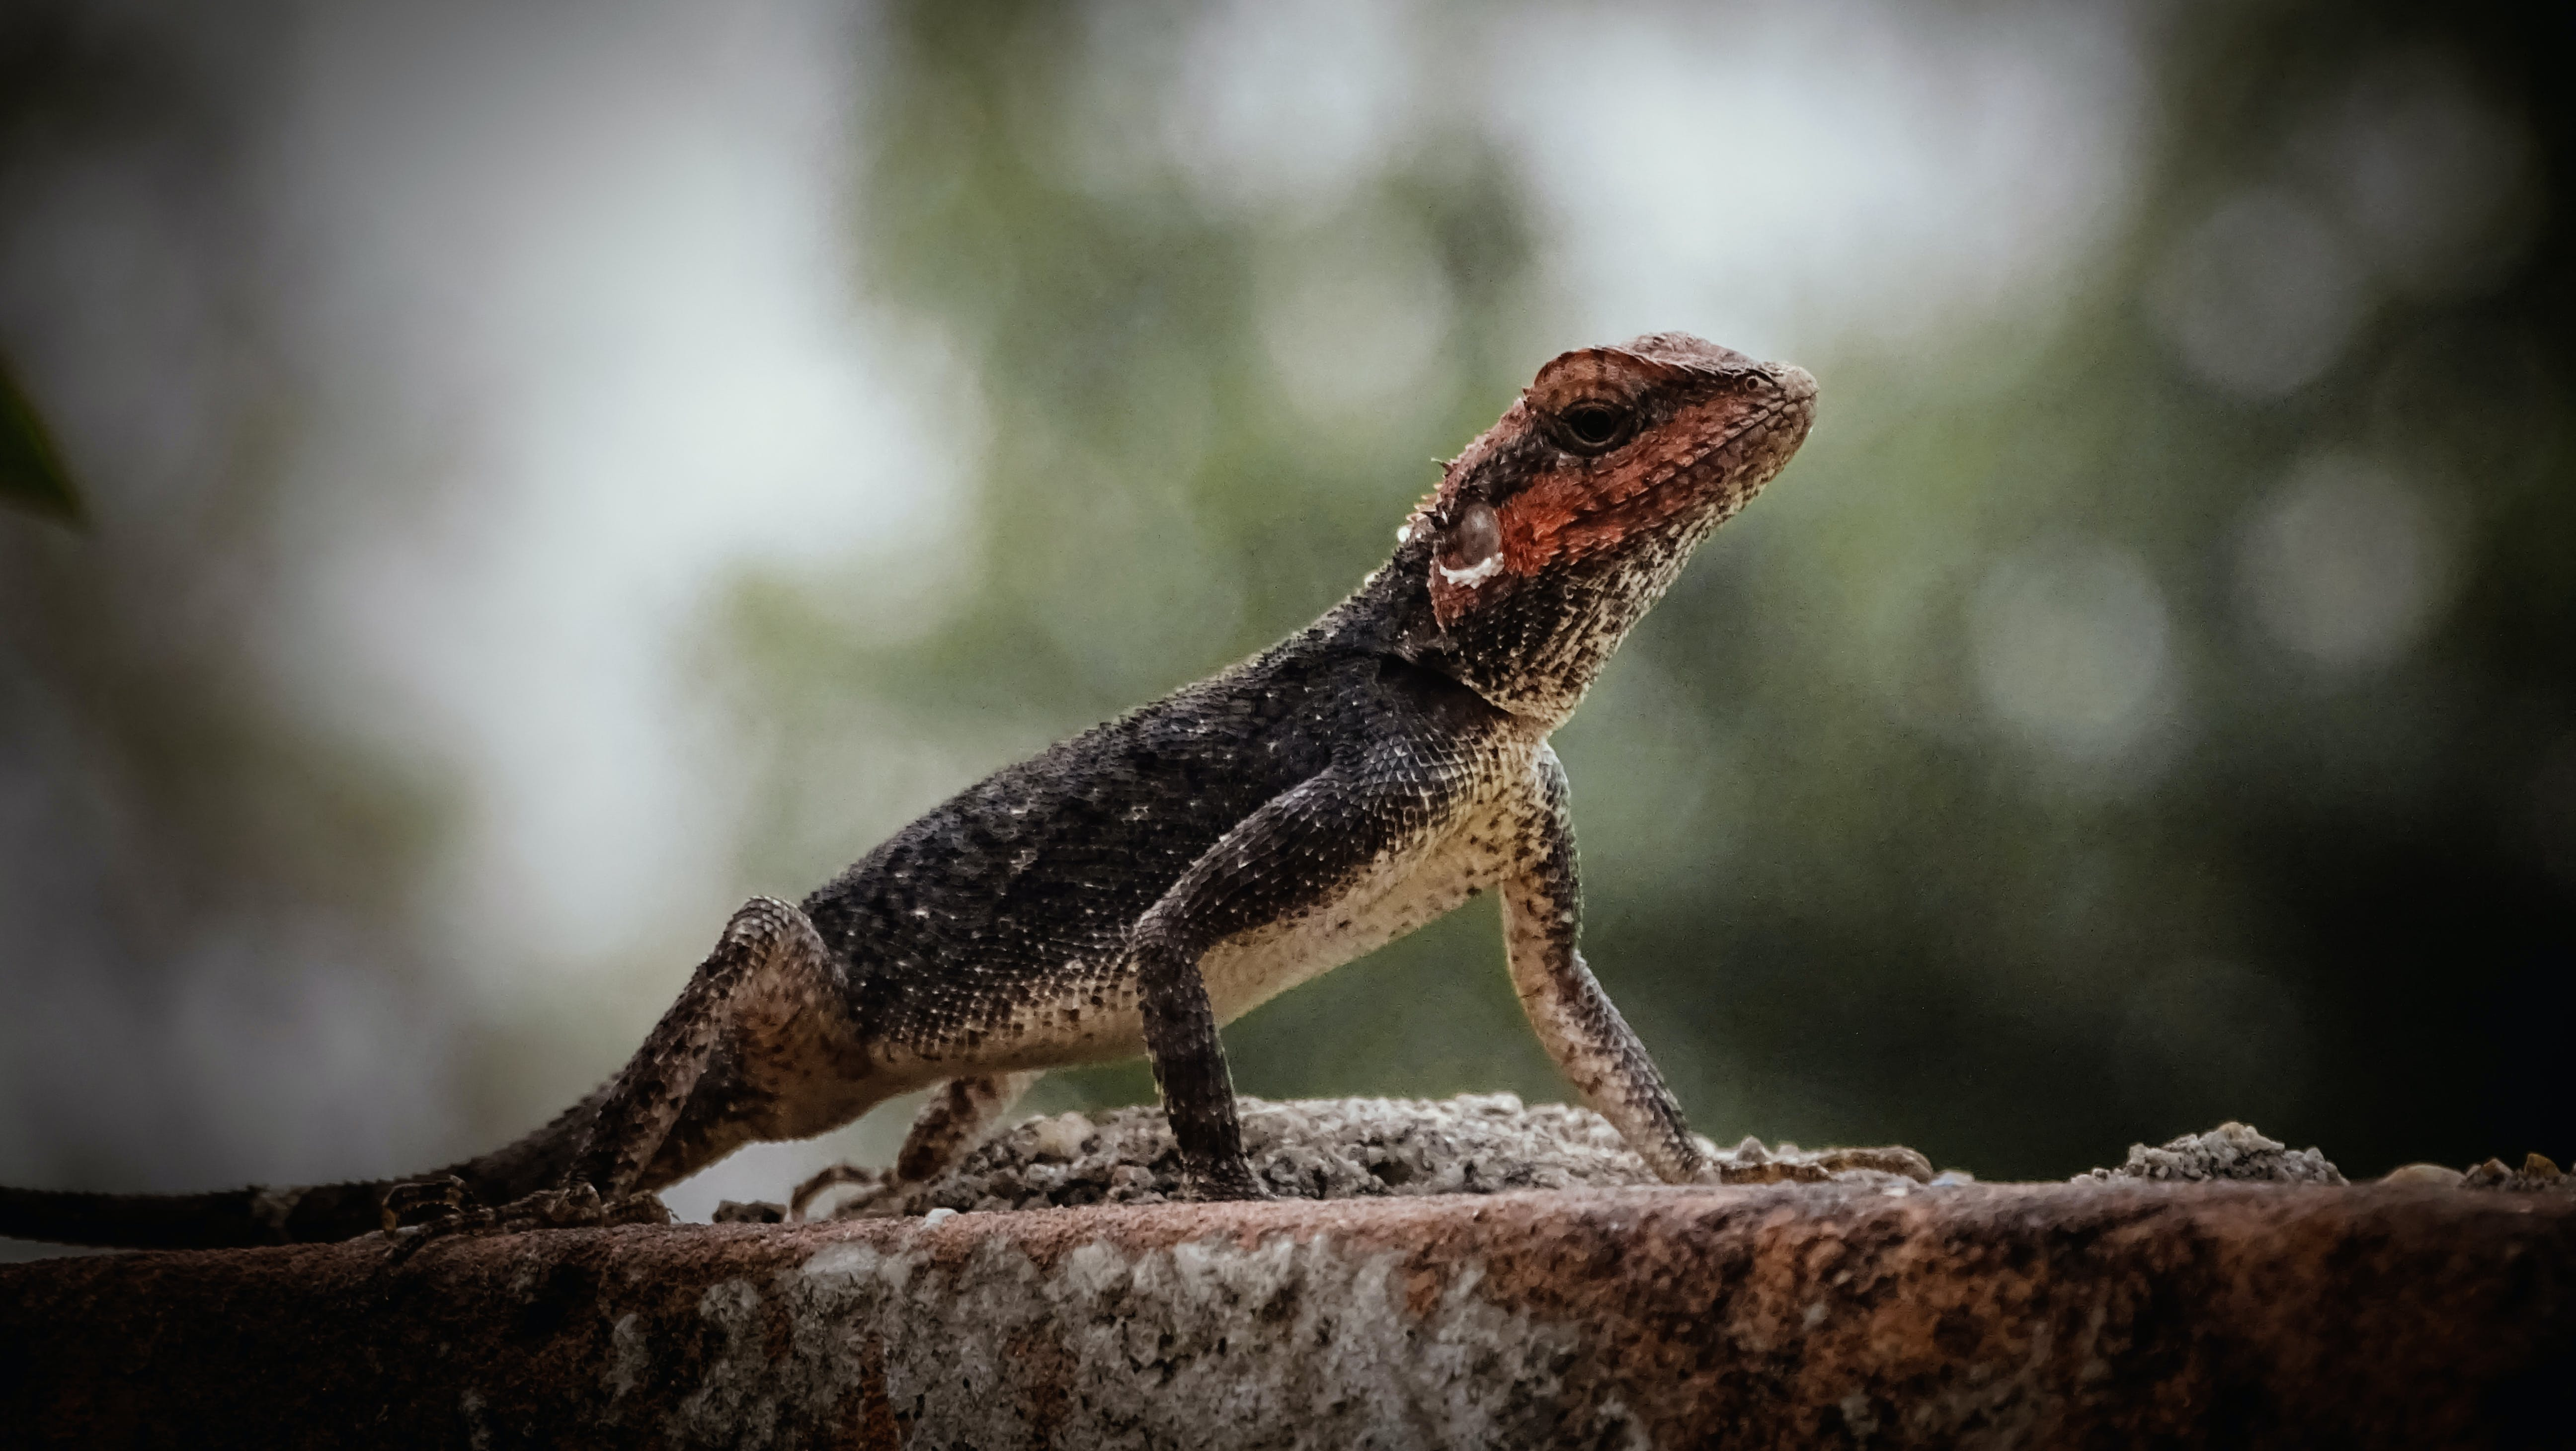 Free stock photo of animal portrait, image, lizard, nature